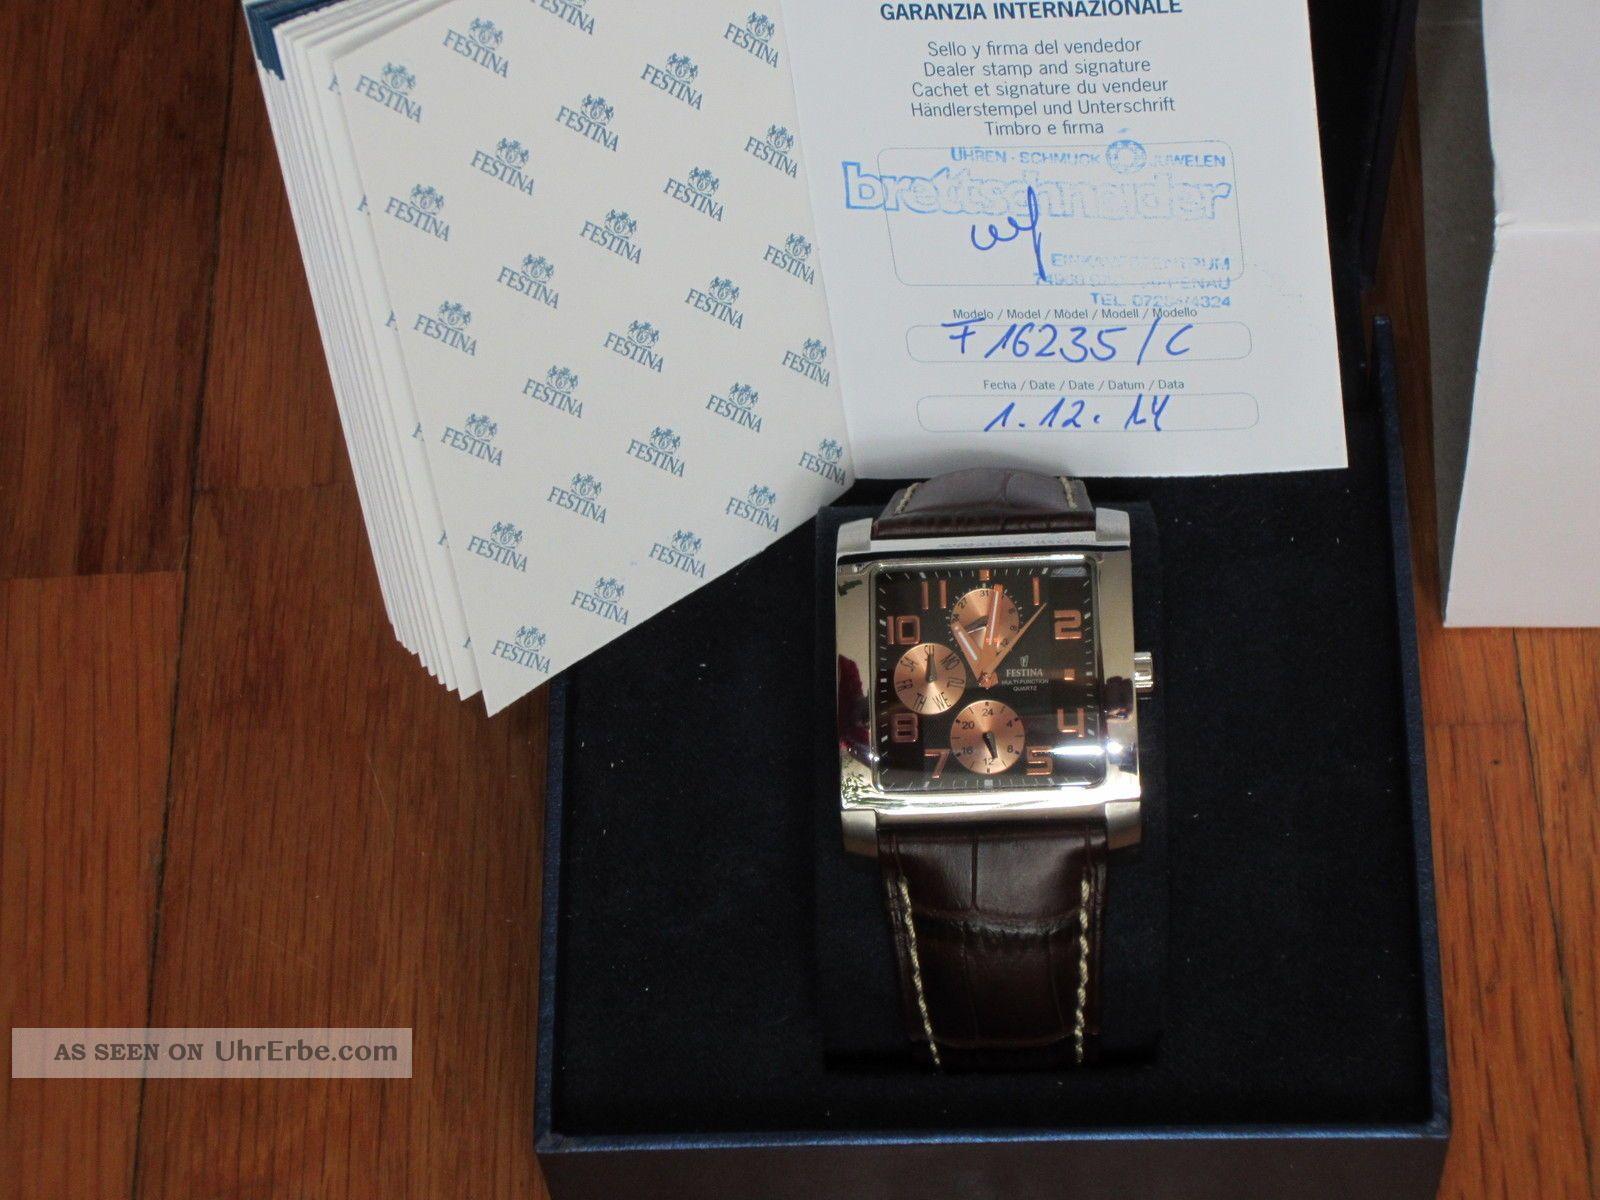 Festina Sport Multifunktion Datum Herrenuhr F16235/c Armbanduhr Uhr Herren Armbanduhren Bild